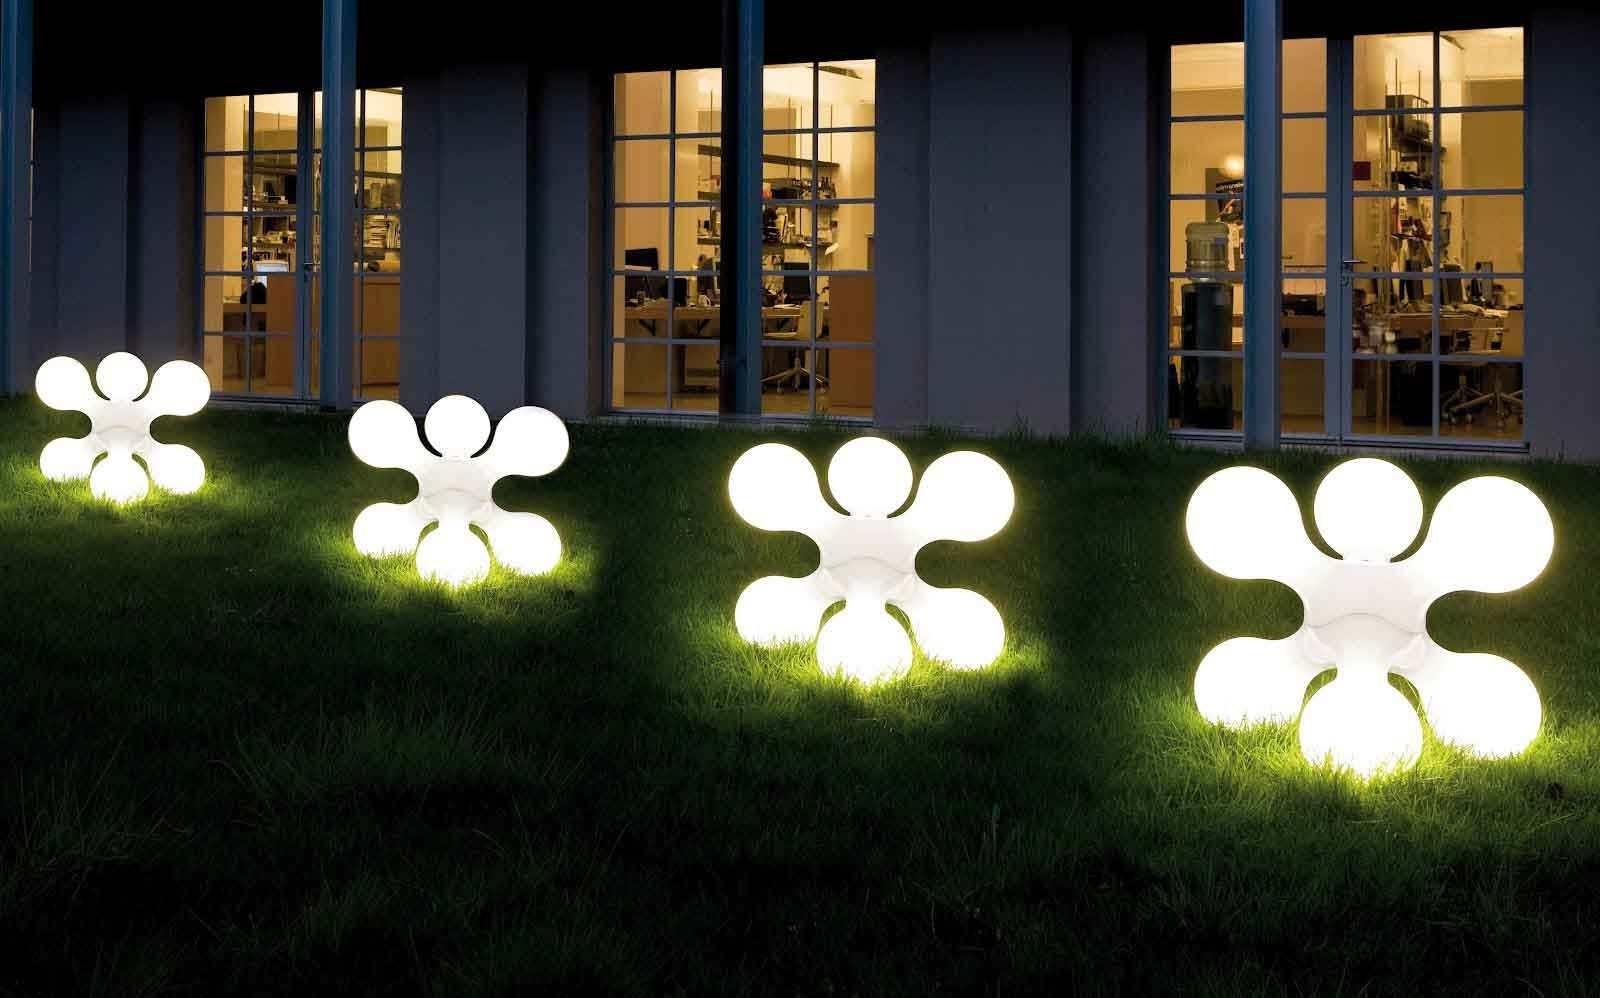 Contemporary Solar Garden Lighting Fixtures Regarding Best And Newest Outdoor Lighting: Trendy Outdoor Lighting 2018 Collection Solar Wall (View 8 of 20)